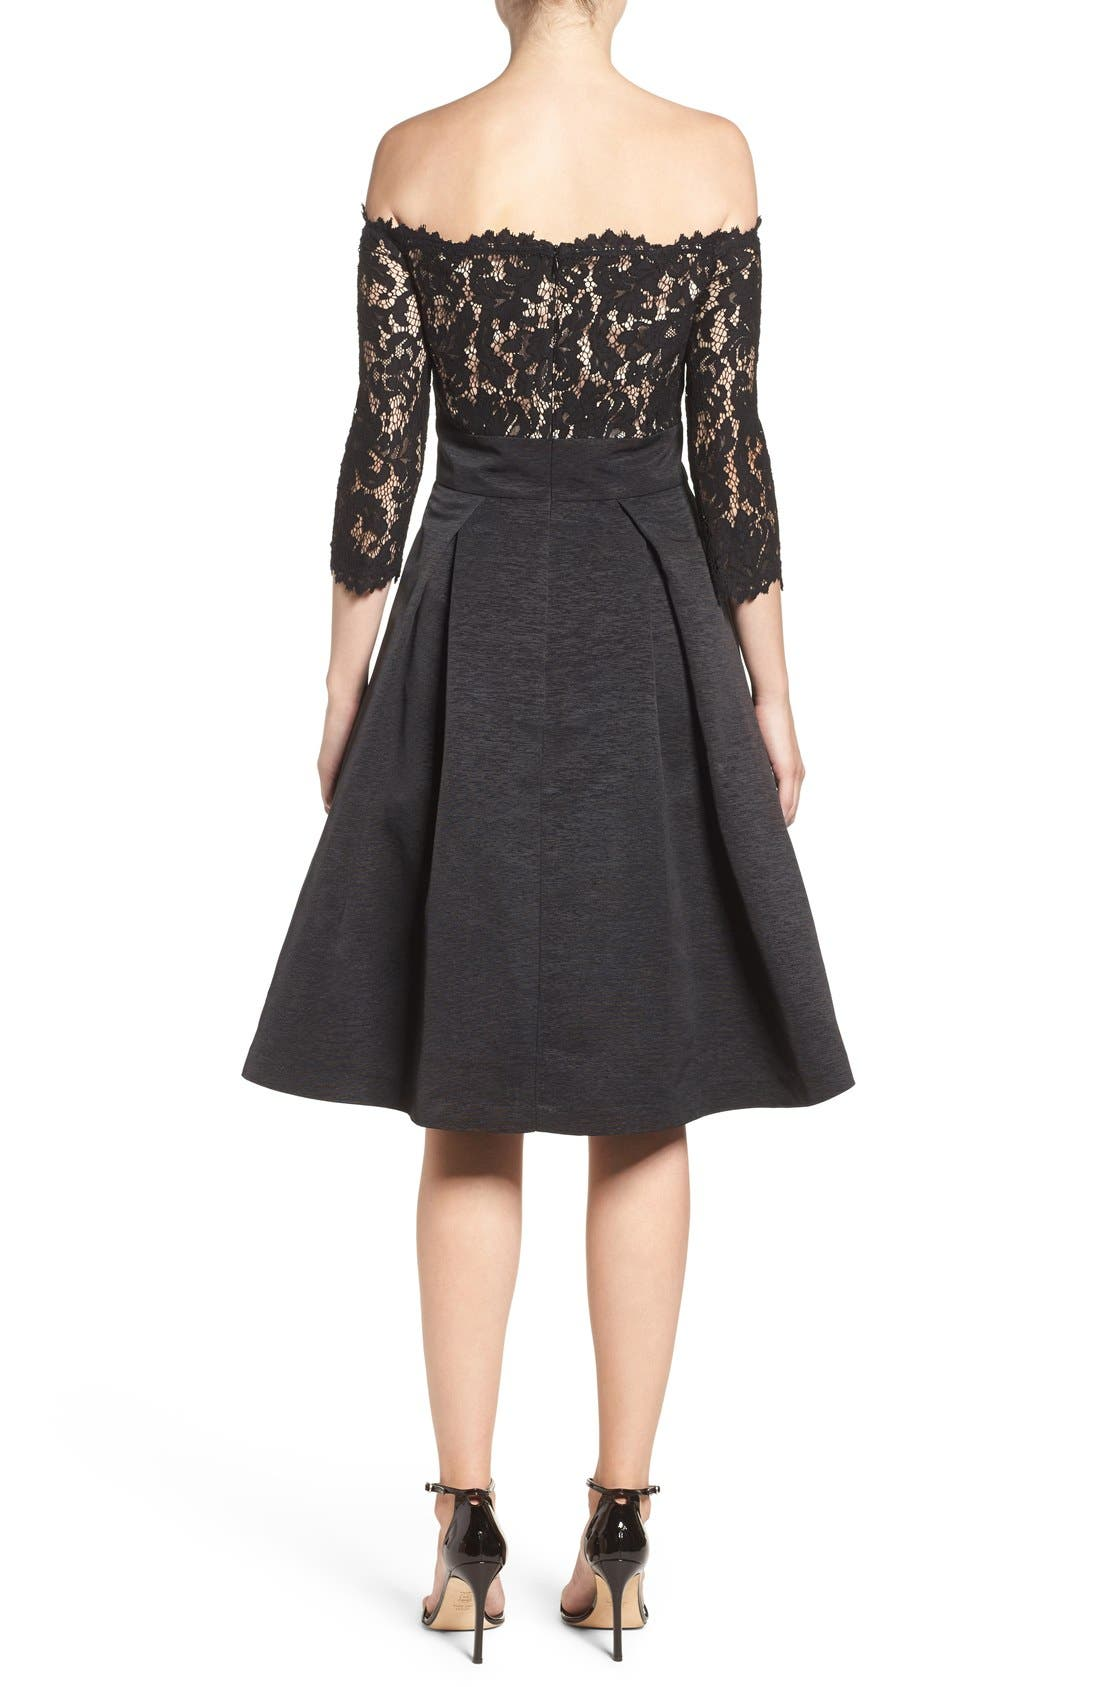 Off the Shoulder A-Line Dress,                             Alternate thumbnail 10, color,                             BLACK